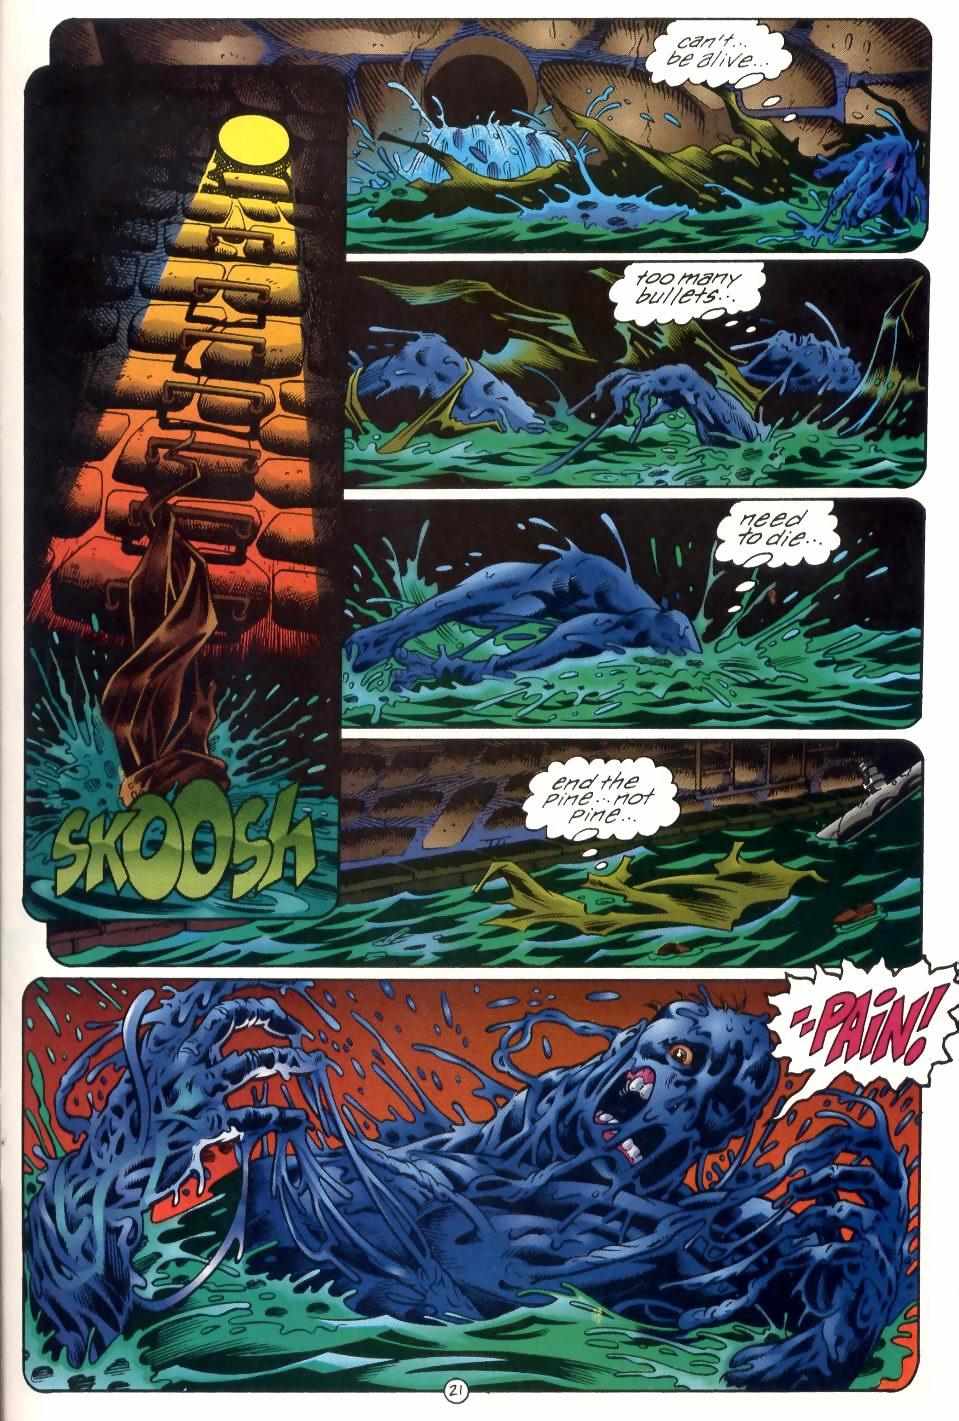 Read online Sludge comic -  Issue #1 - 22